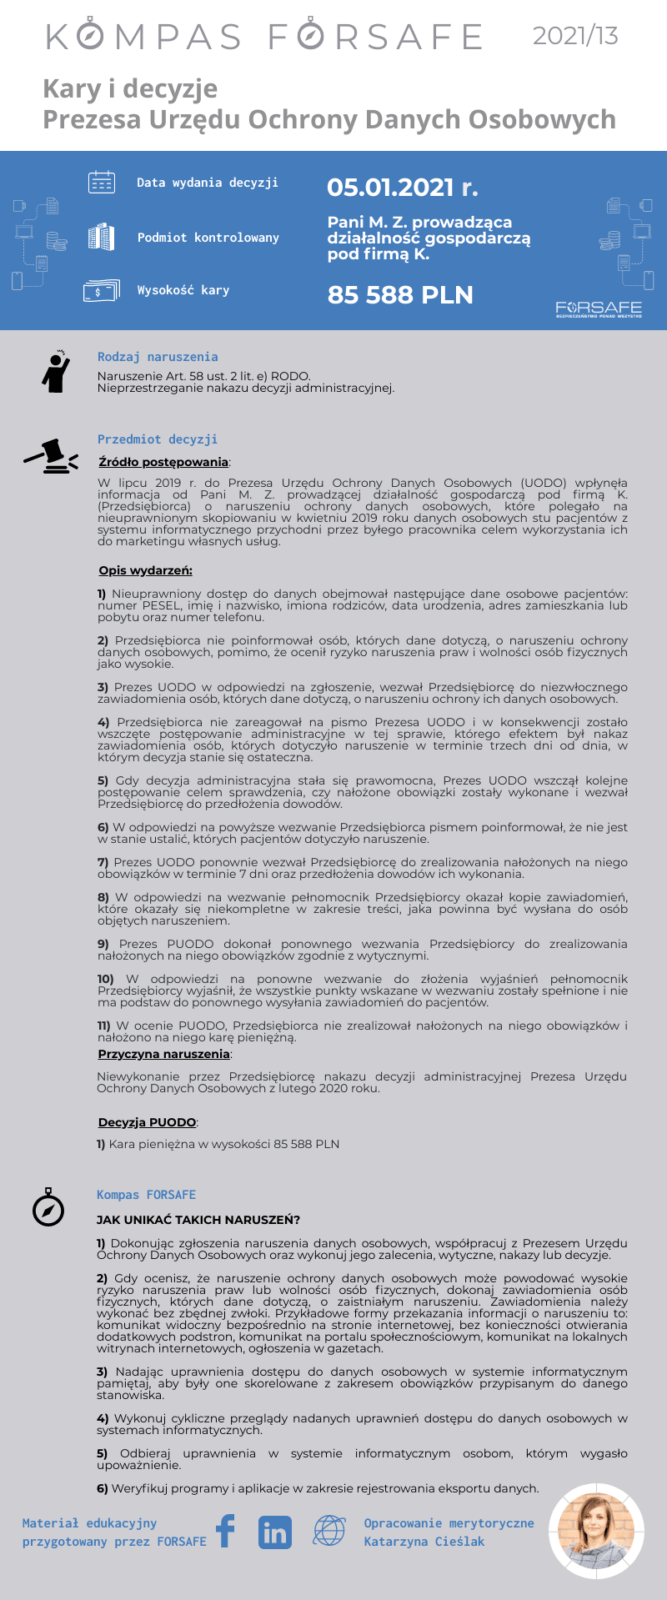 Kompas FORSAFE PL 2021 13 KOMPAS FORSAFE PL 2021/13 - Kara za lekceważenie nakazu PUODO